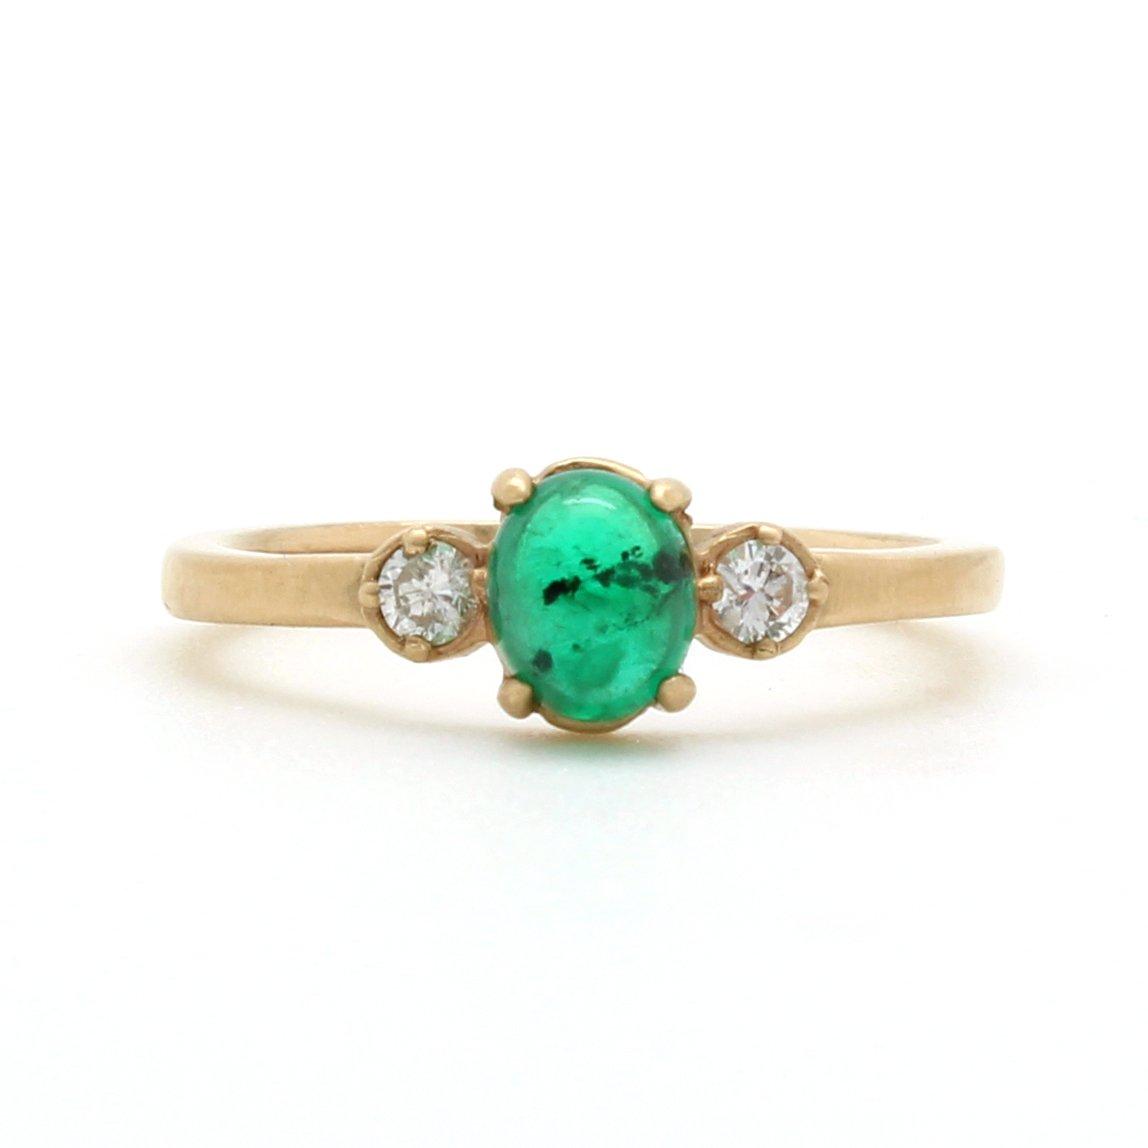 Emerald cut wedding rings yellow gold